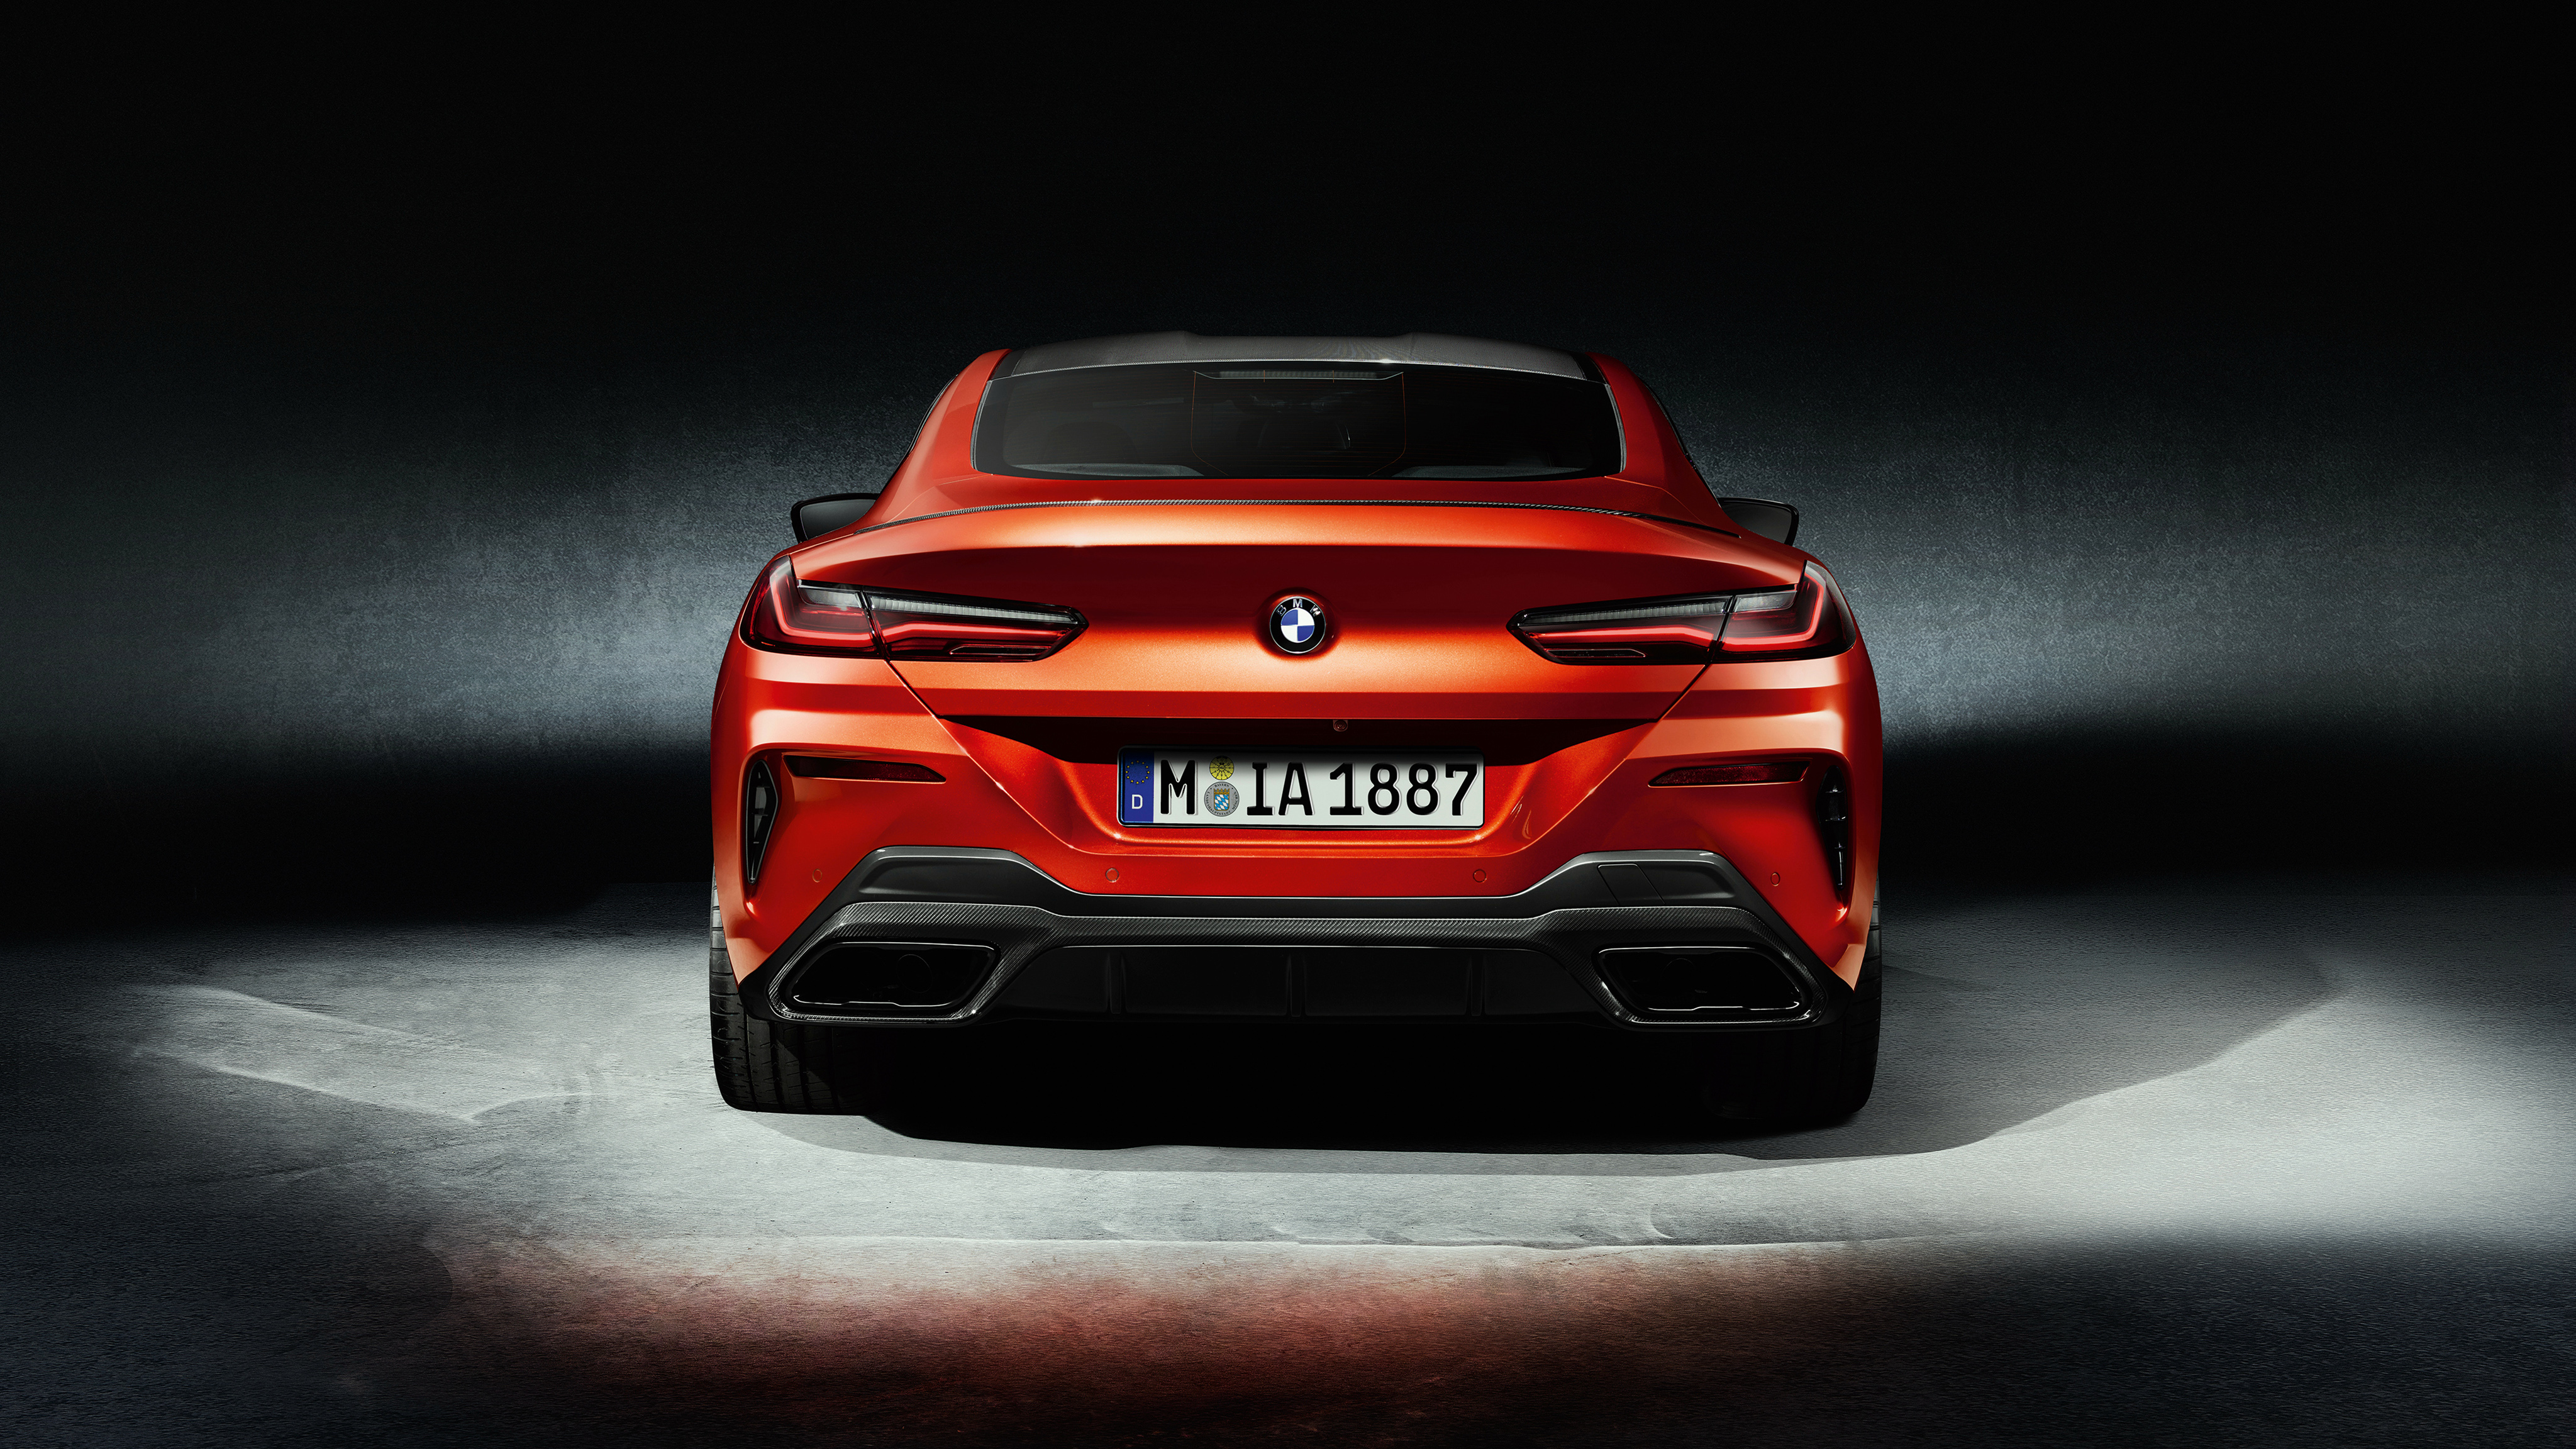 Lexus Car Dealership >> BMW M850i xDrive Carbon Package 2018 4K 3 Wallpaper | HD Car Wallpapers | ID #10673